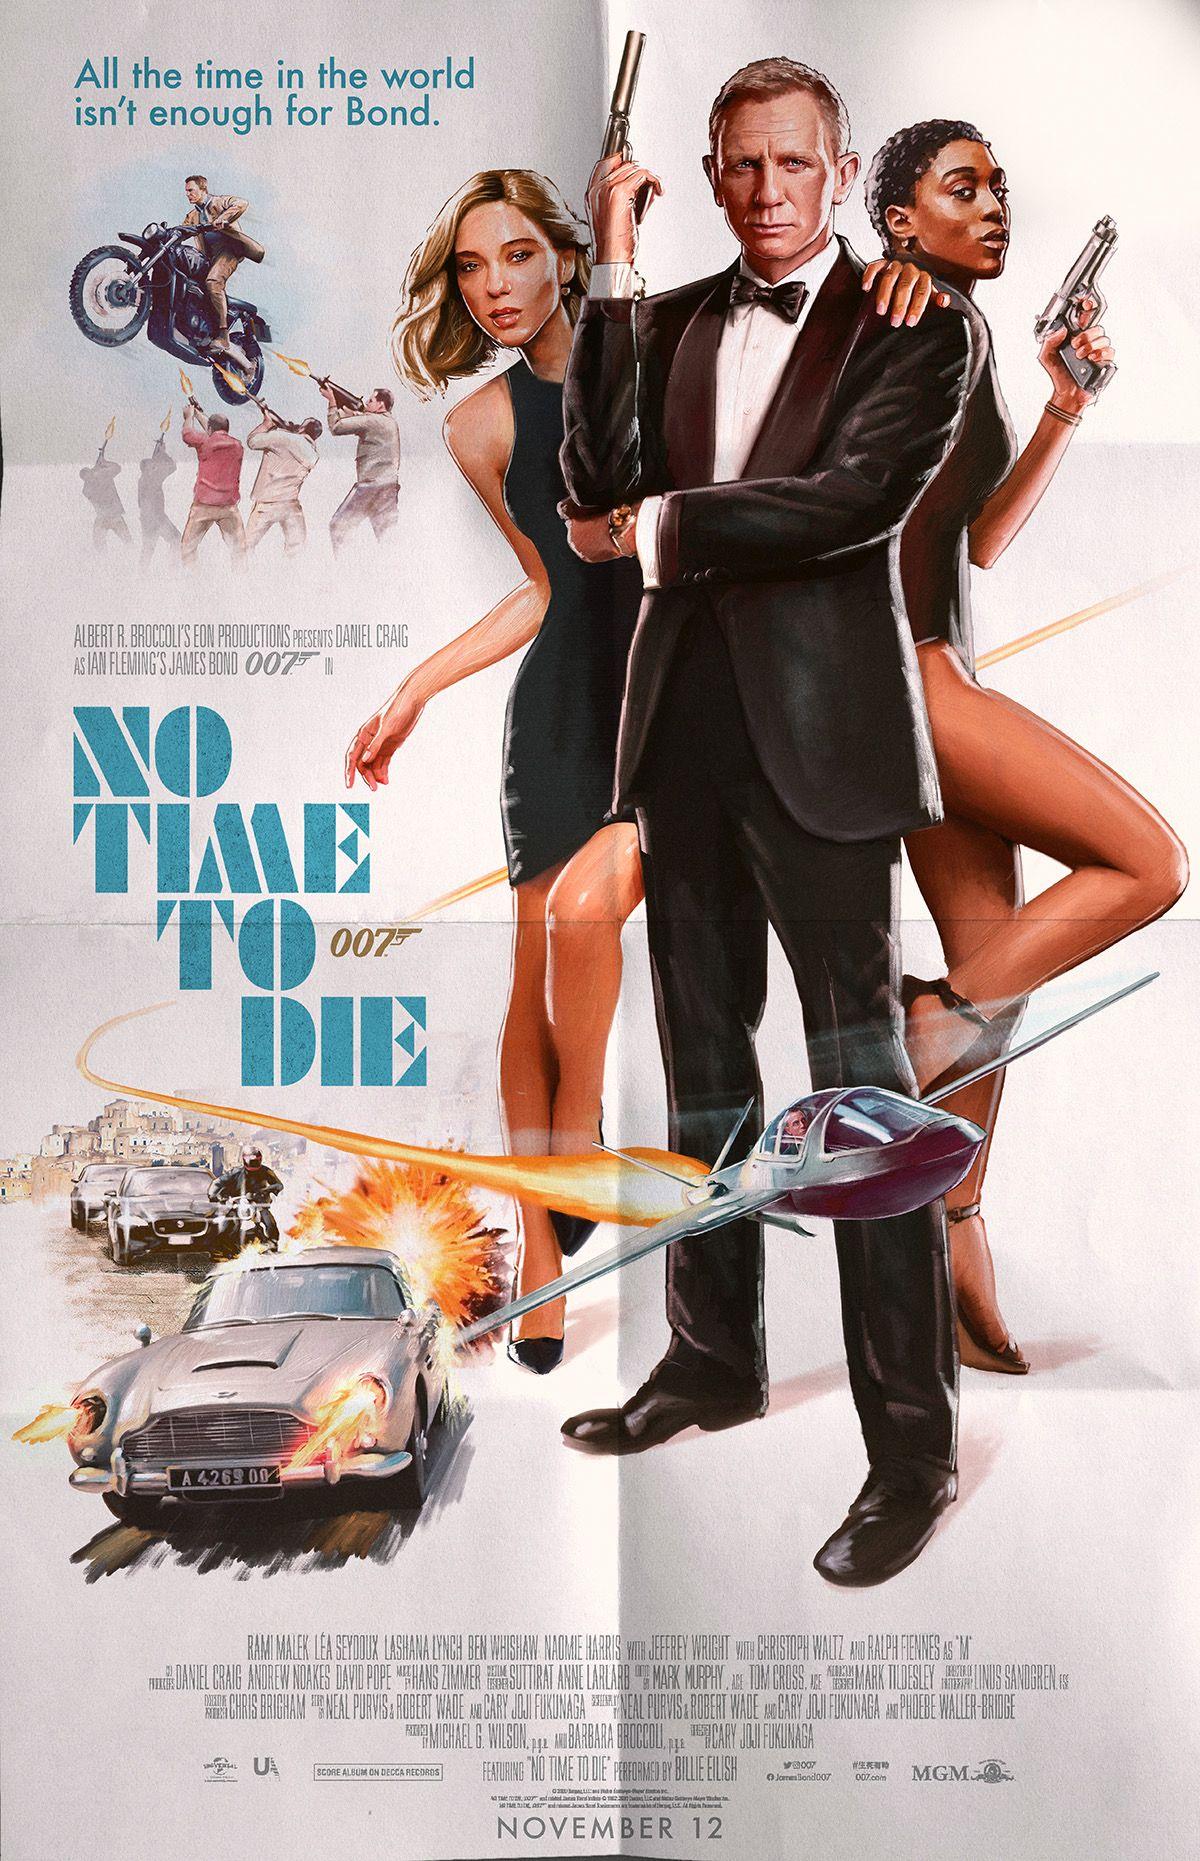 Pin By Daniel Gomez On Cinema In 2020 James Bond Movie Posters